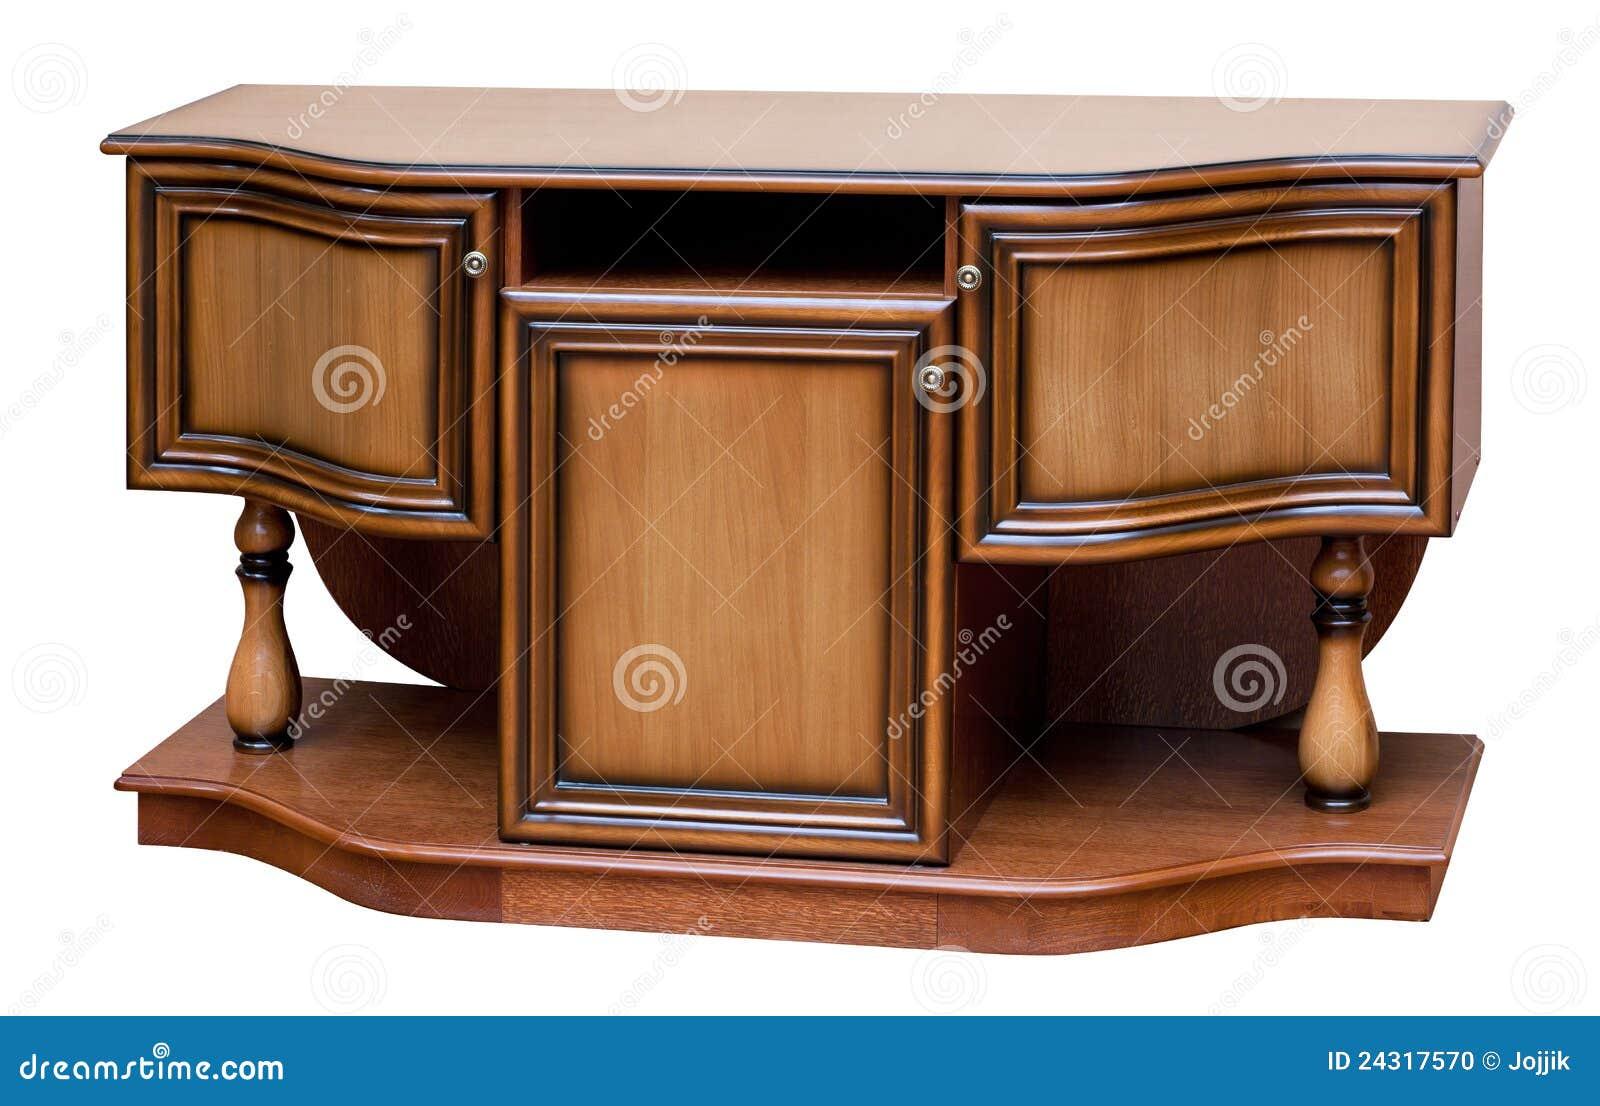 Wooden old stile bureau stock photo image 24317570 for Bureau stock